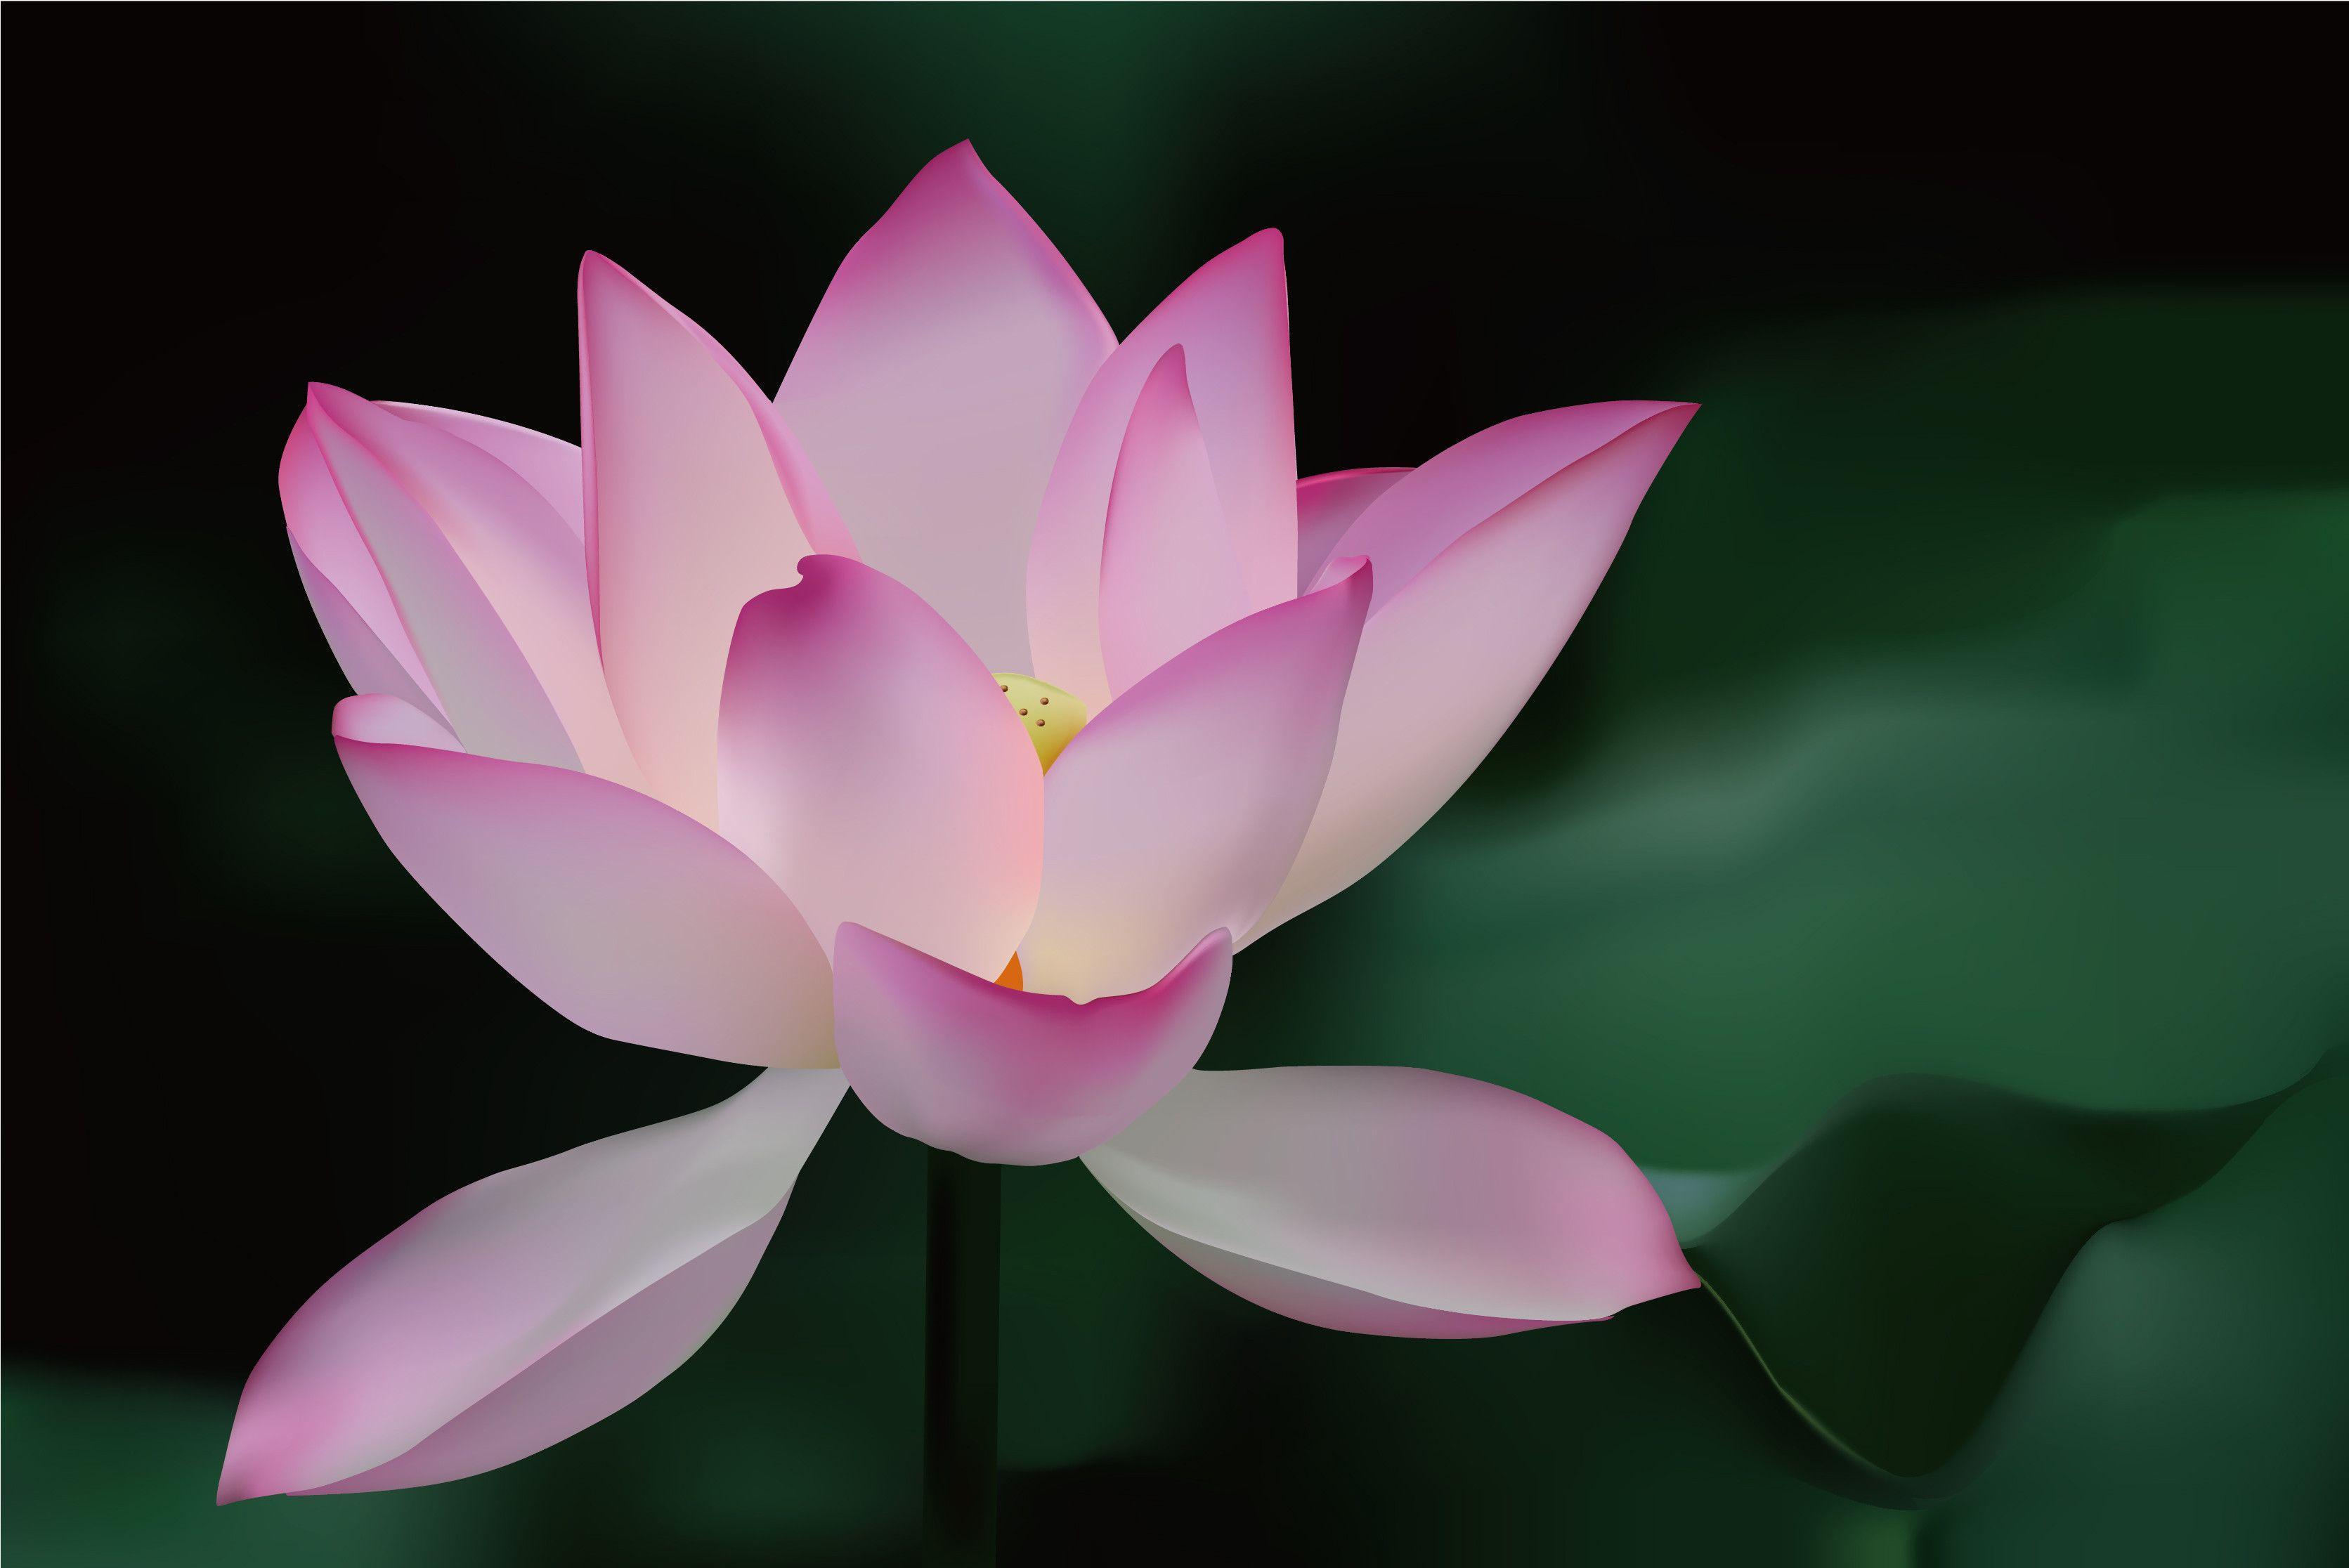 Lotus Flower Backgrounds Wallpaper Cave